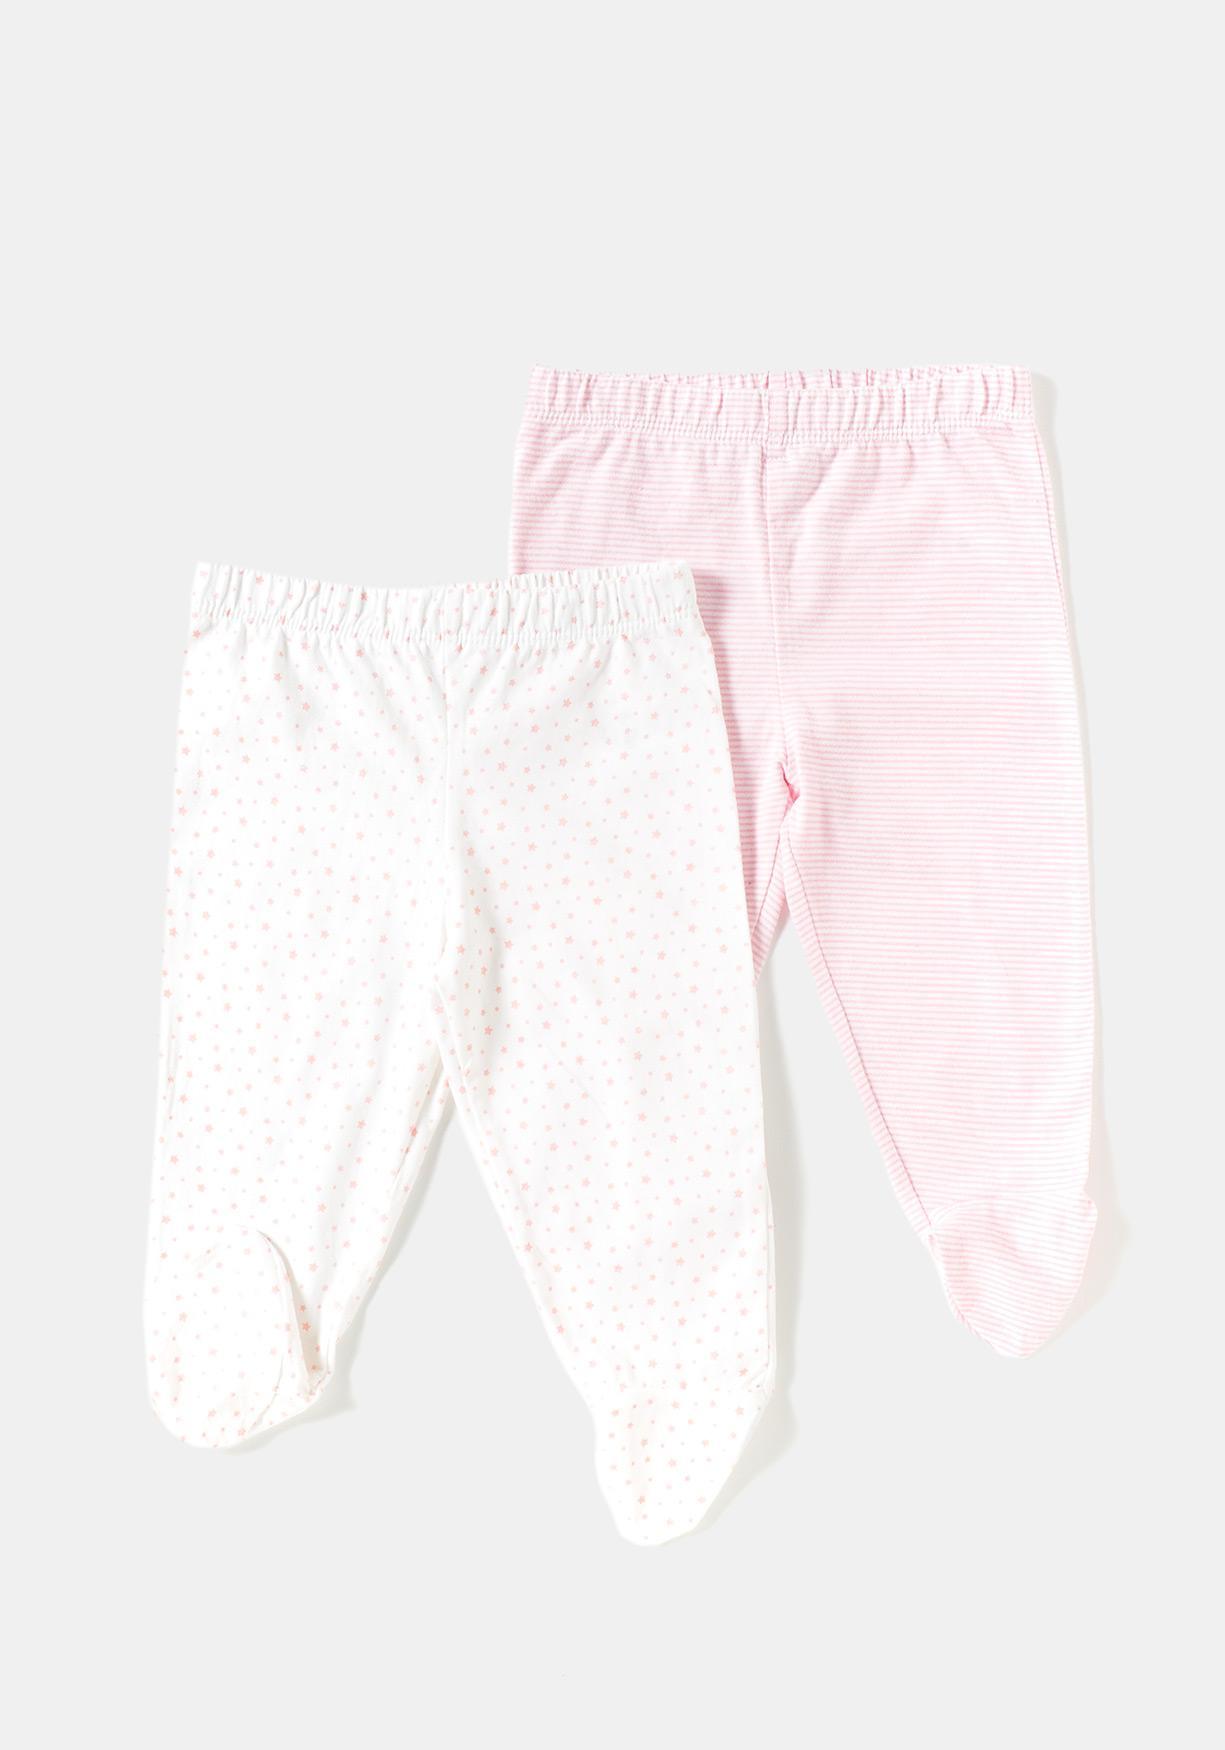 Comprar Pack de dos polainas de recién nacido algodón sostenible TEX ... 744c77ccd338